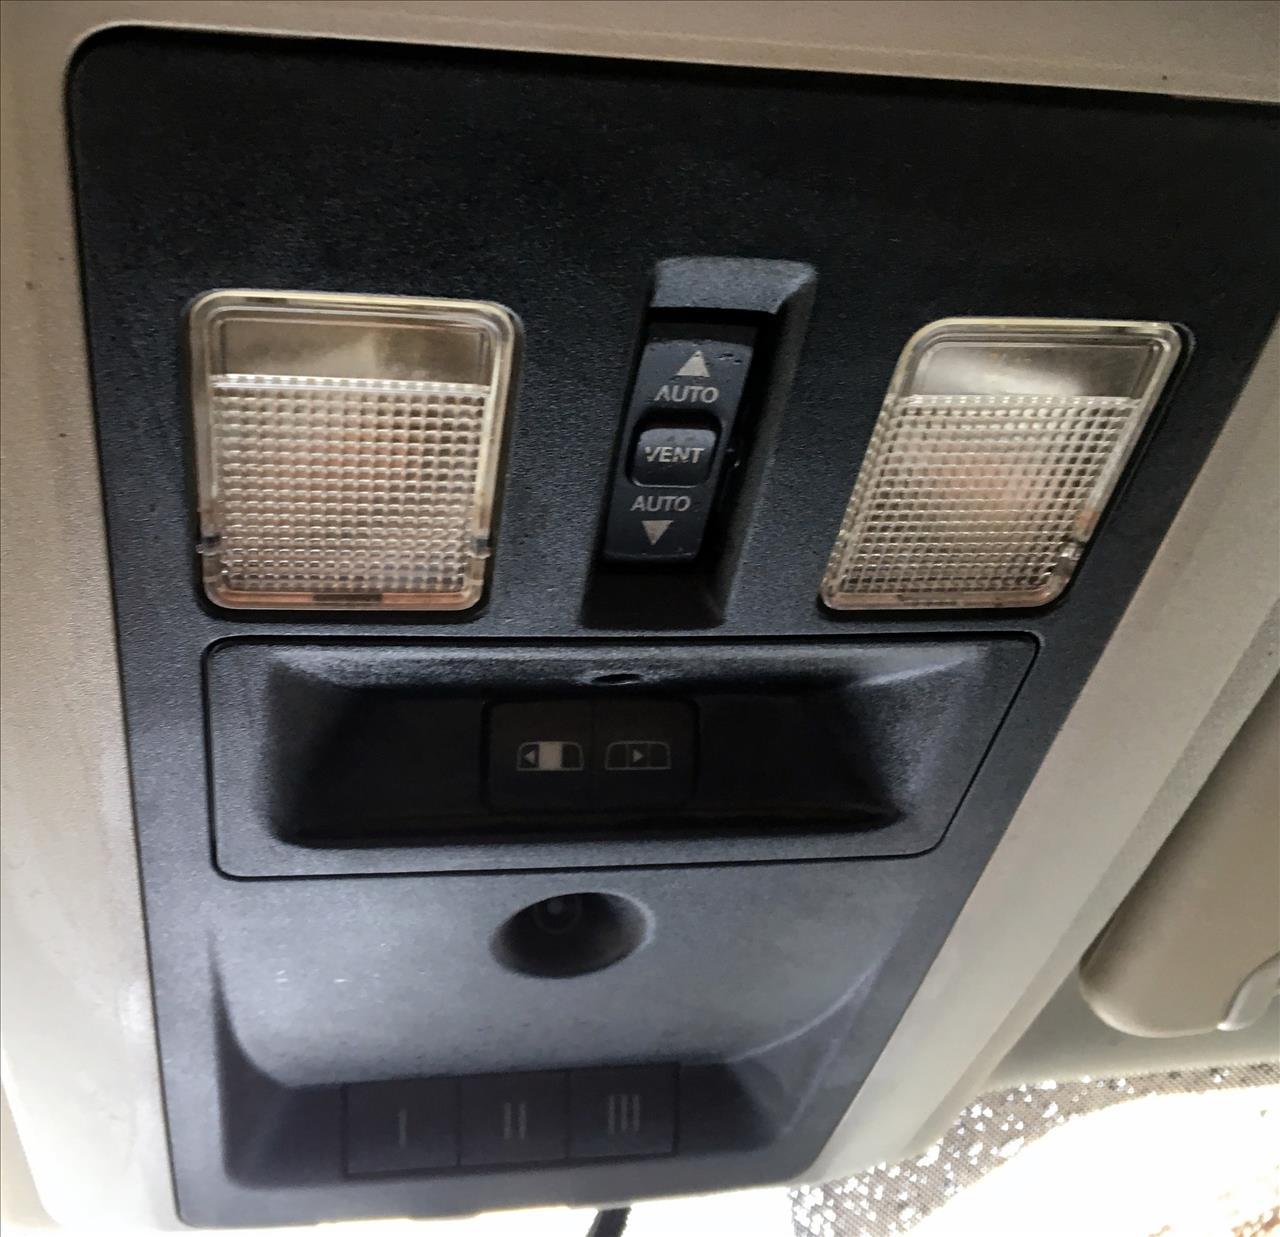 2009 dodge ram pickup 1500 in hettinger nd rz motors inc for Rz motors inc hettinger nd